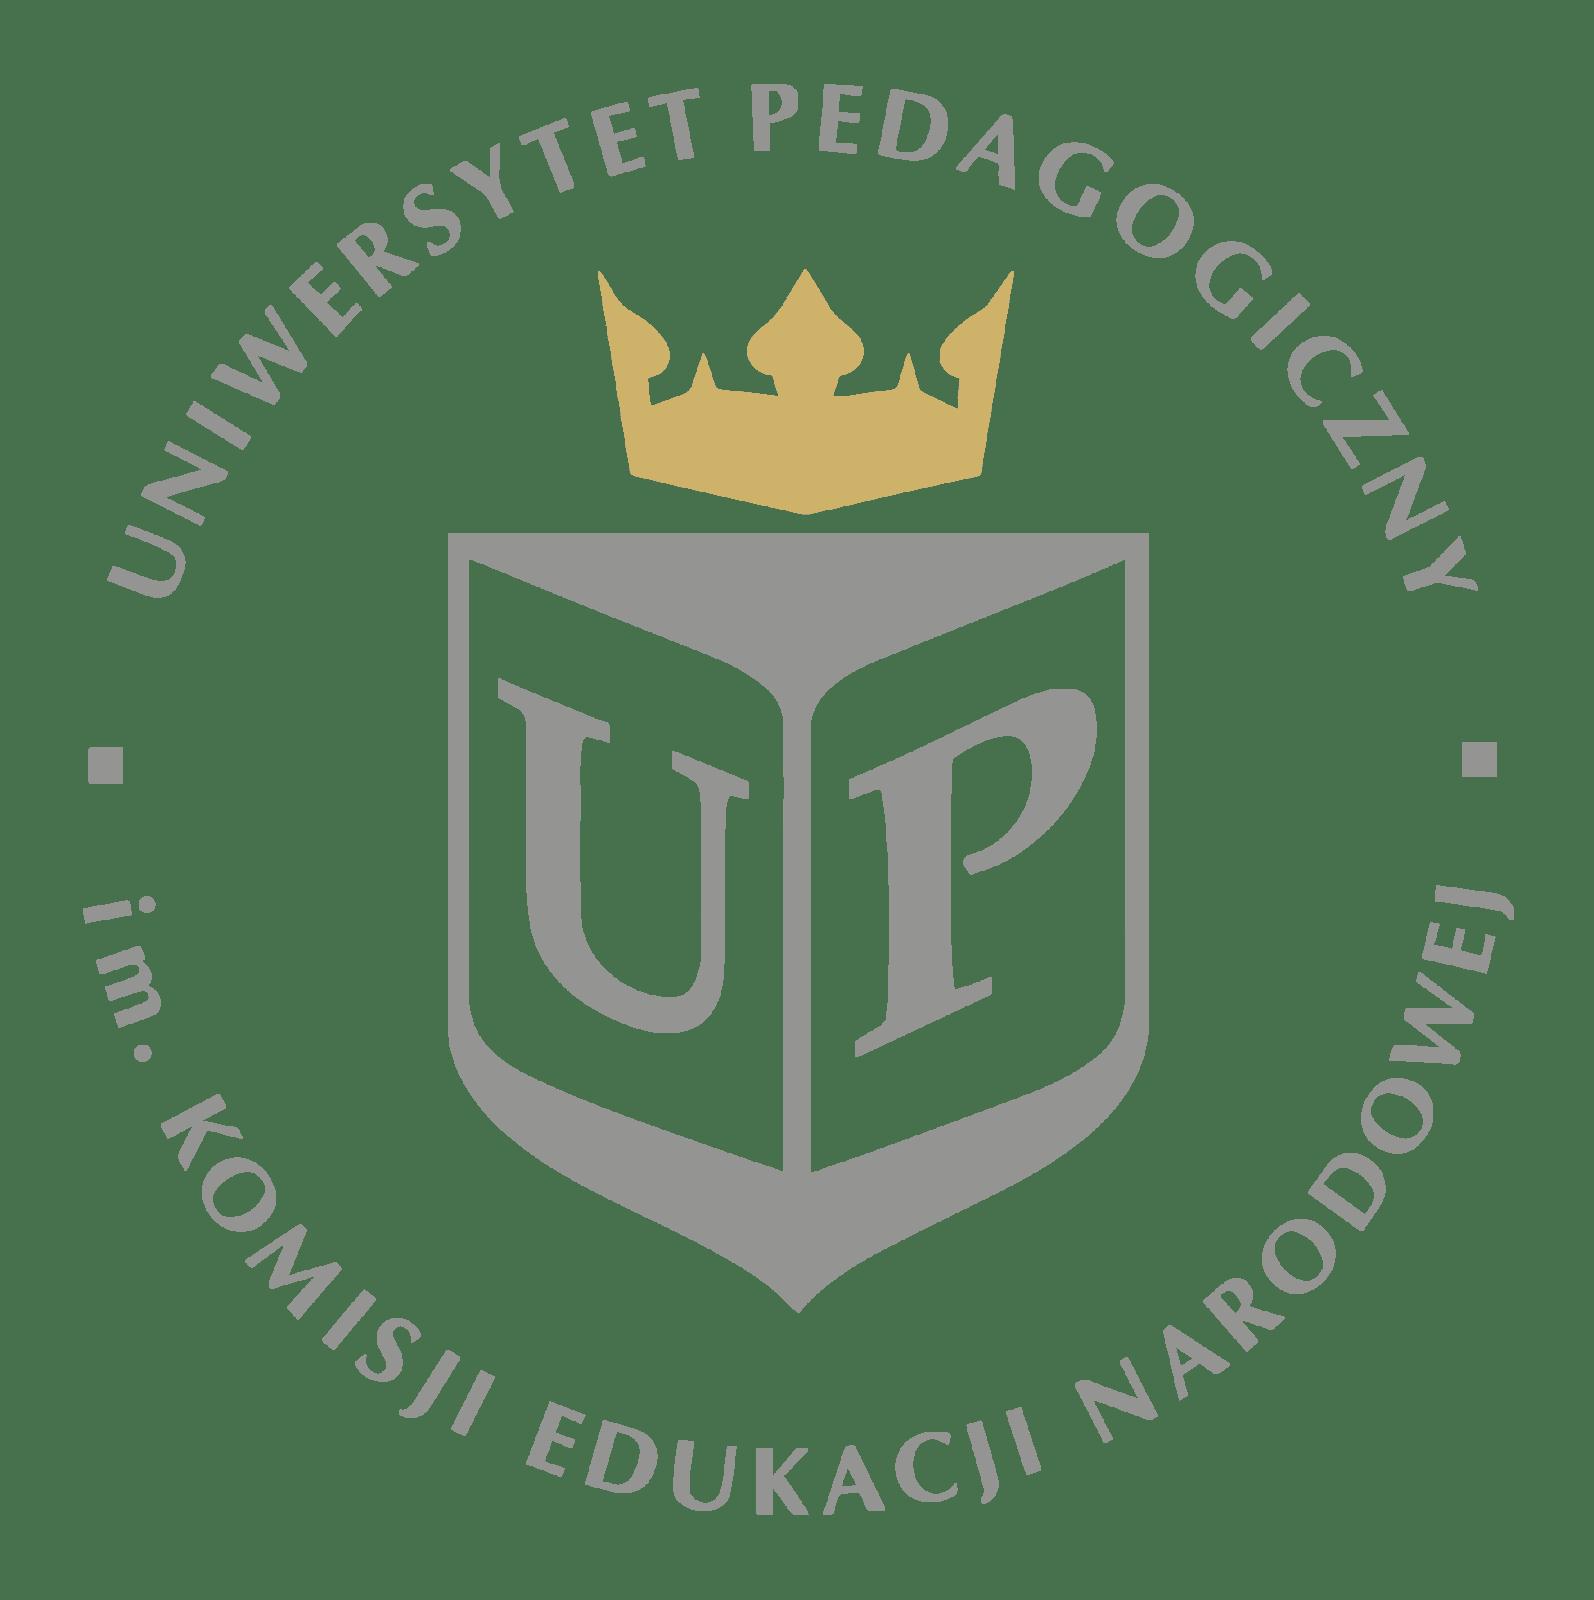 Instytutem Historii i Archiwistyki Uniwersytetu Pedagogicznego w Krakowie